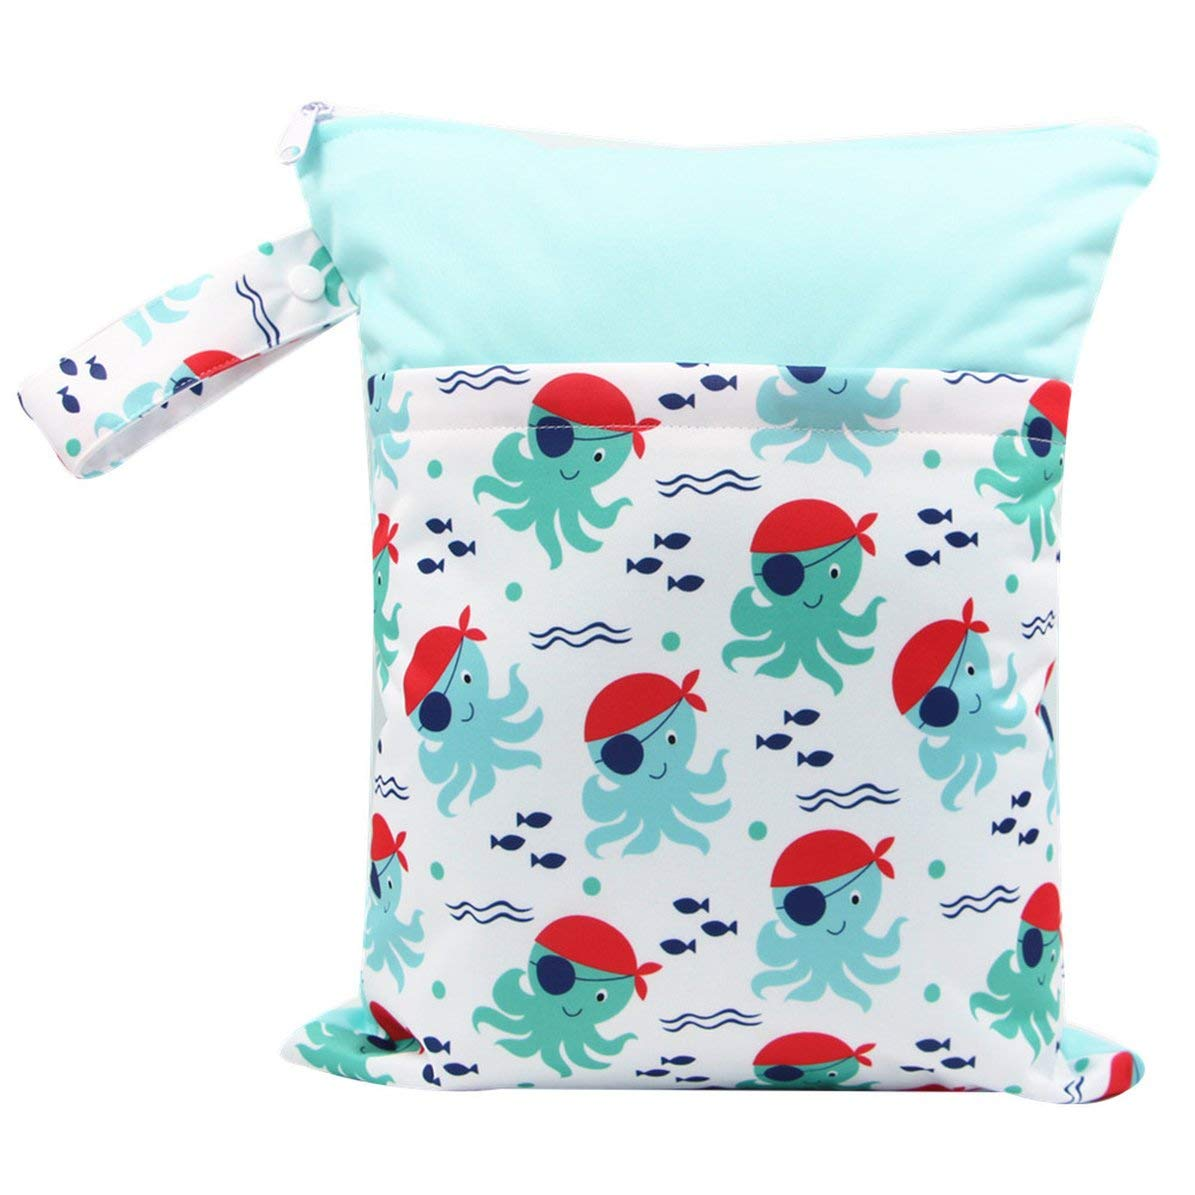 Impermeable Reutilizable Port/átil Pa/ñales de tela Bolso mojado con bolsillo de cremallera Almacenamiento de equipaje de viaje Organizador de bolsa para beb/és beb/és WEIWEITOE